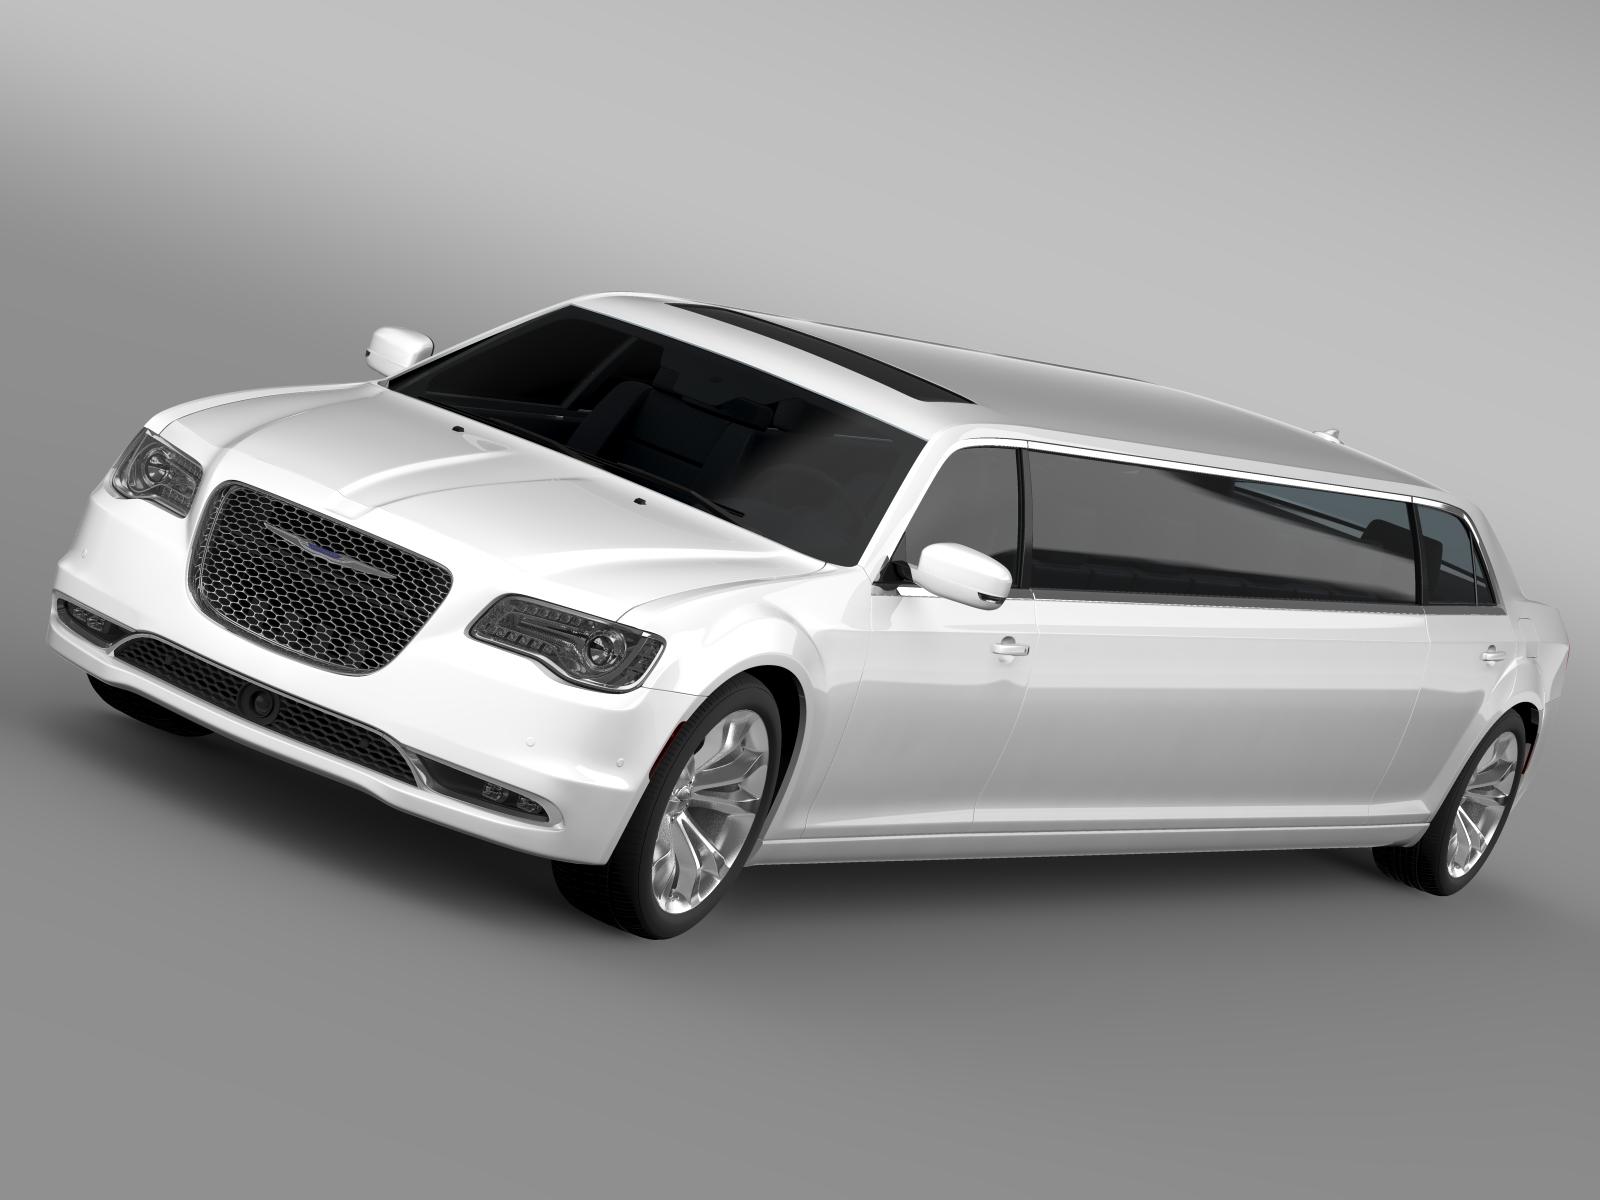 chrysler 300c platinum limousine lx2 2016 3d modelo 3ds max fbx c4d lwo ma mb hrc xsi obj 216046